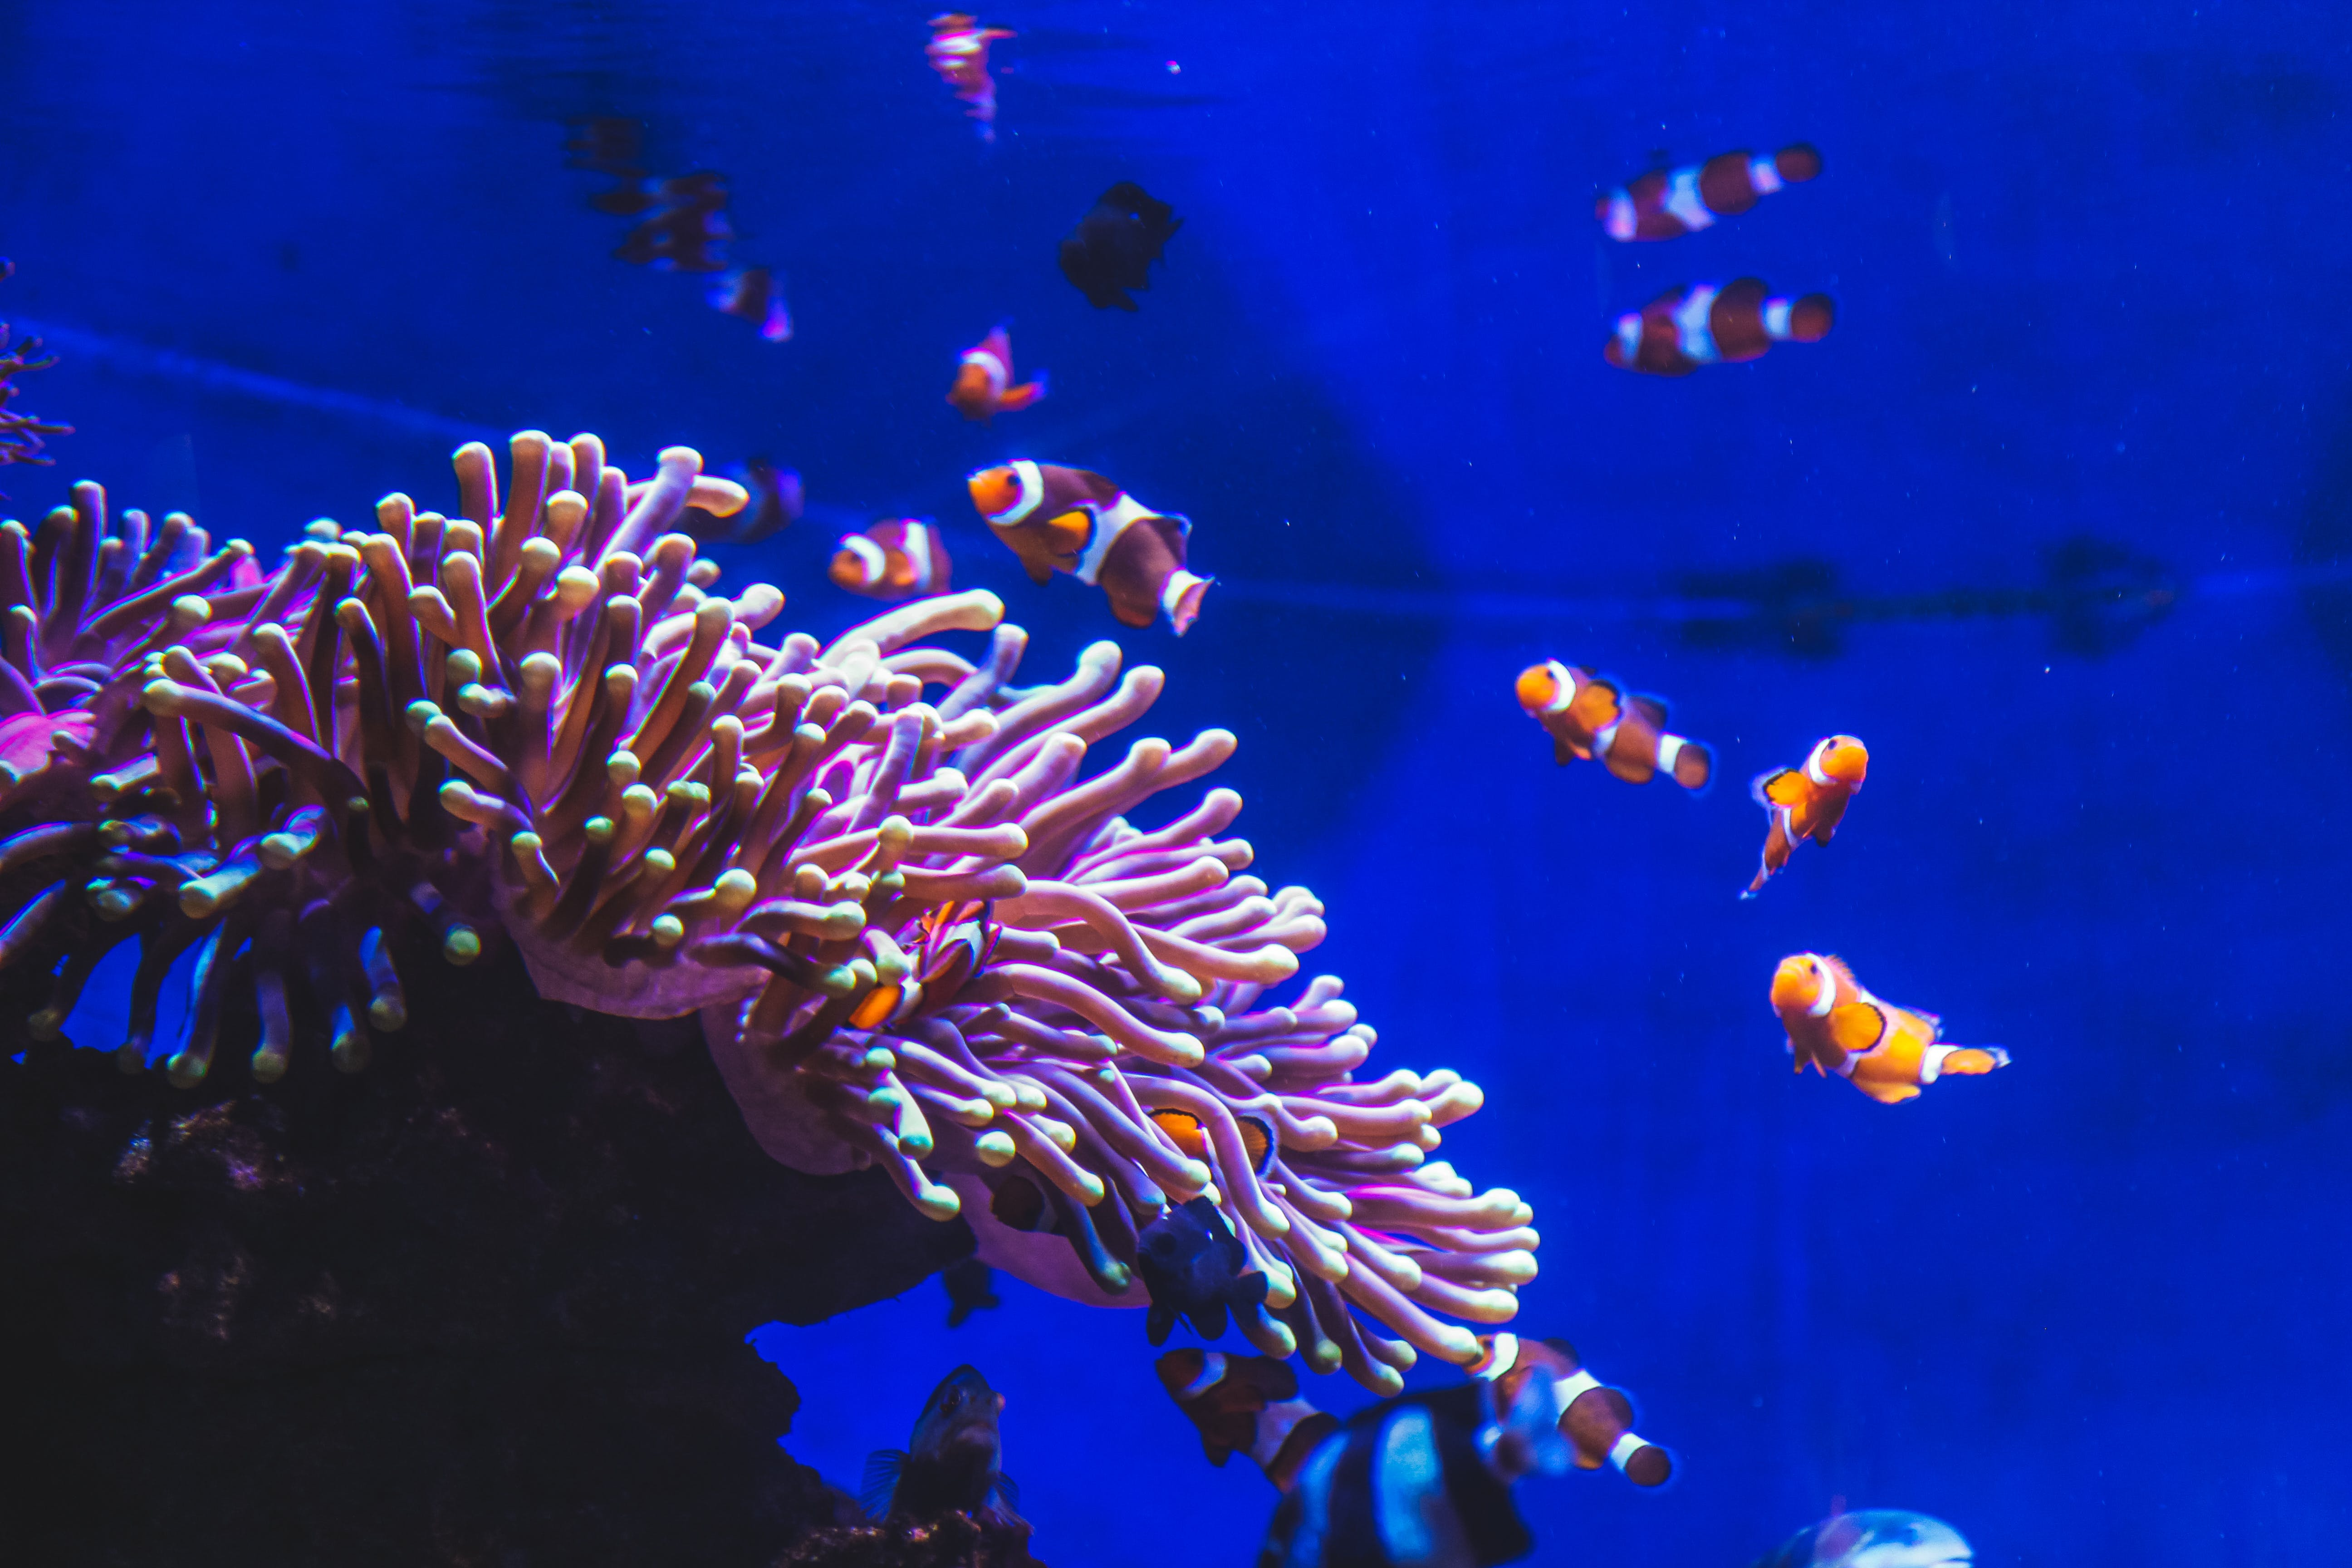 Free stock photo of aquarium, barcelona, blue water, calm waters